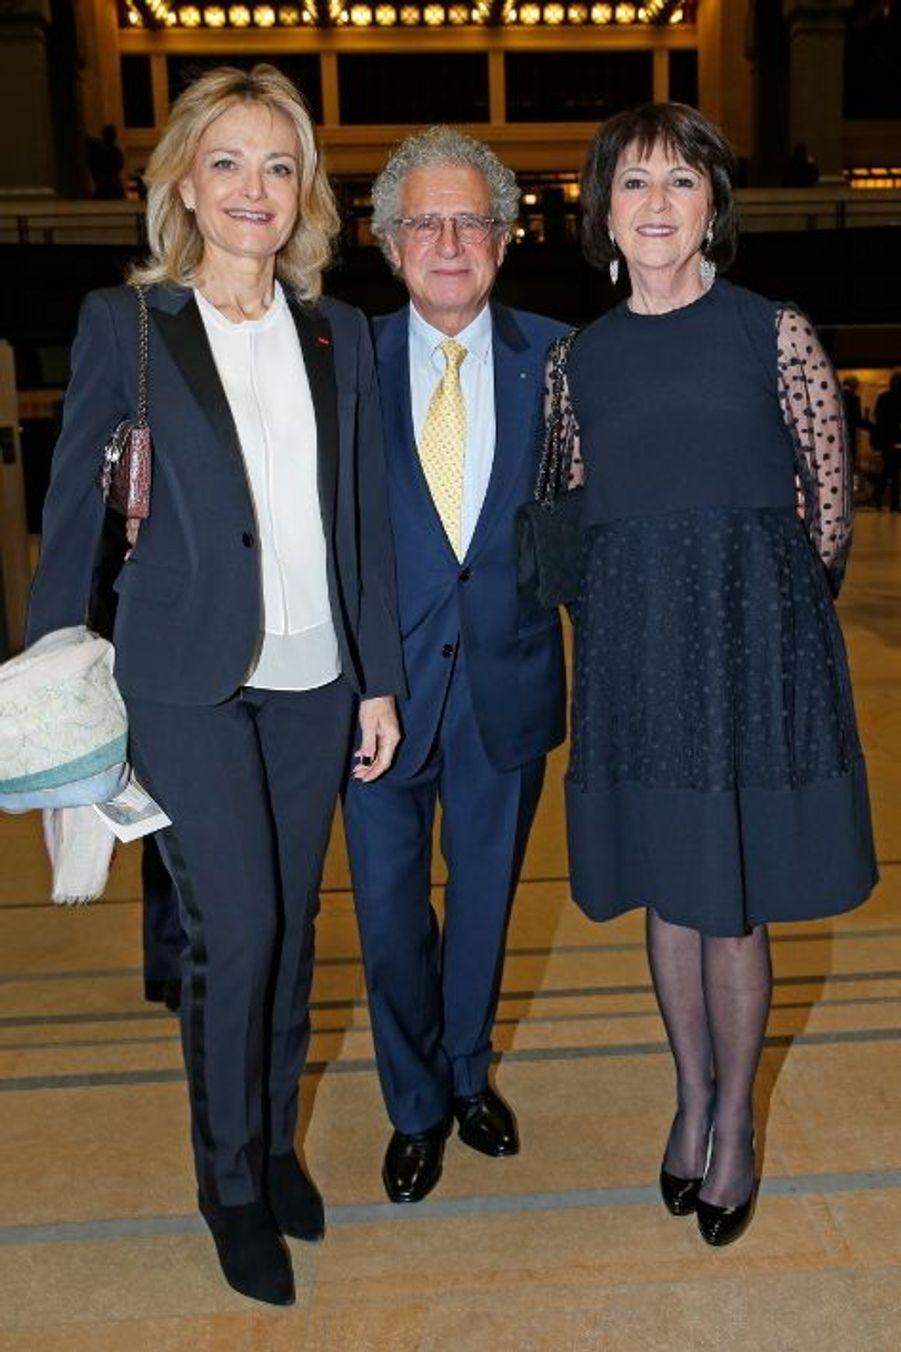 Florence de Botton, Laurent et Martine Dassault.